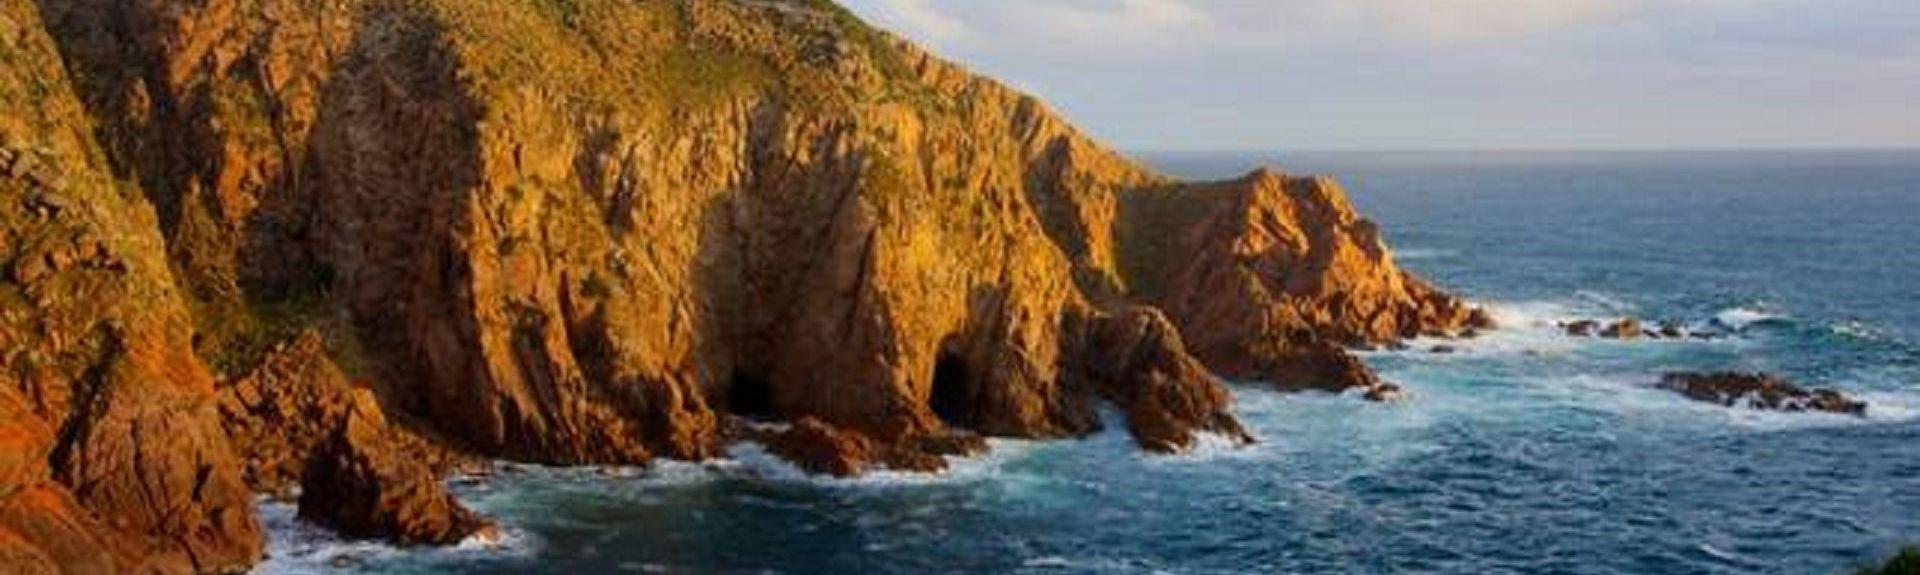 Coronet Bay, Victoria, Australie